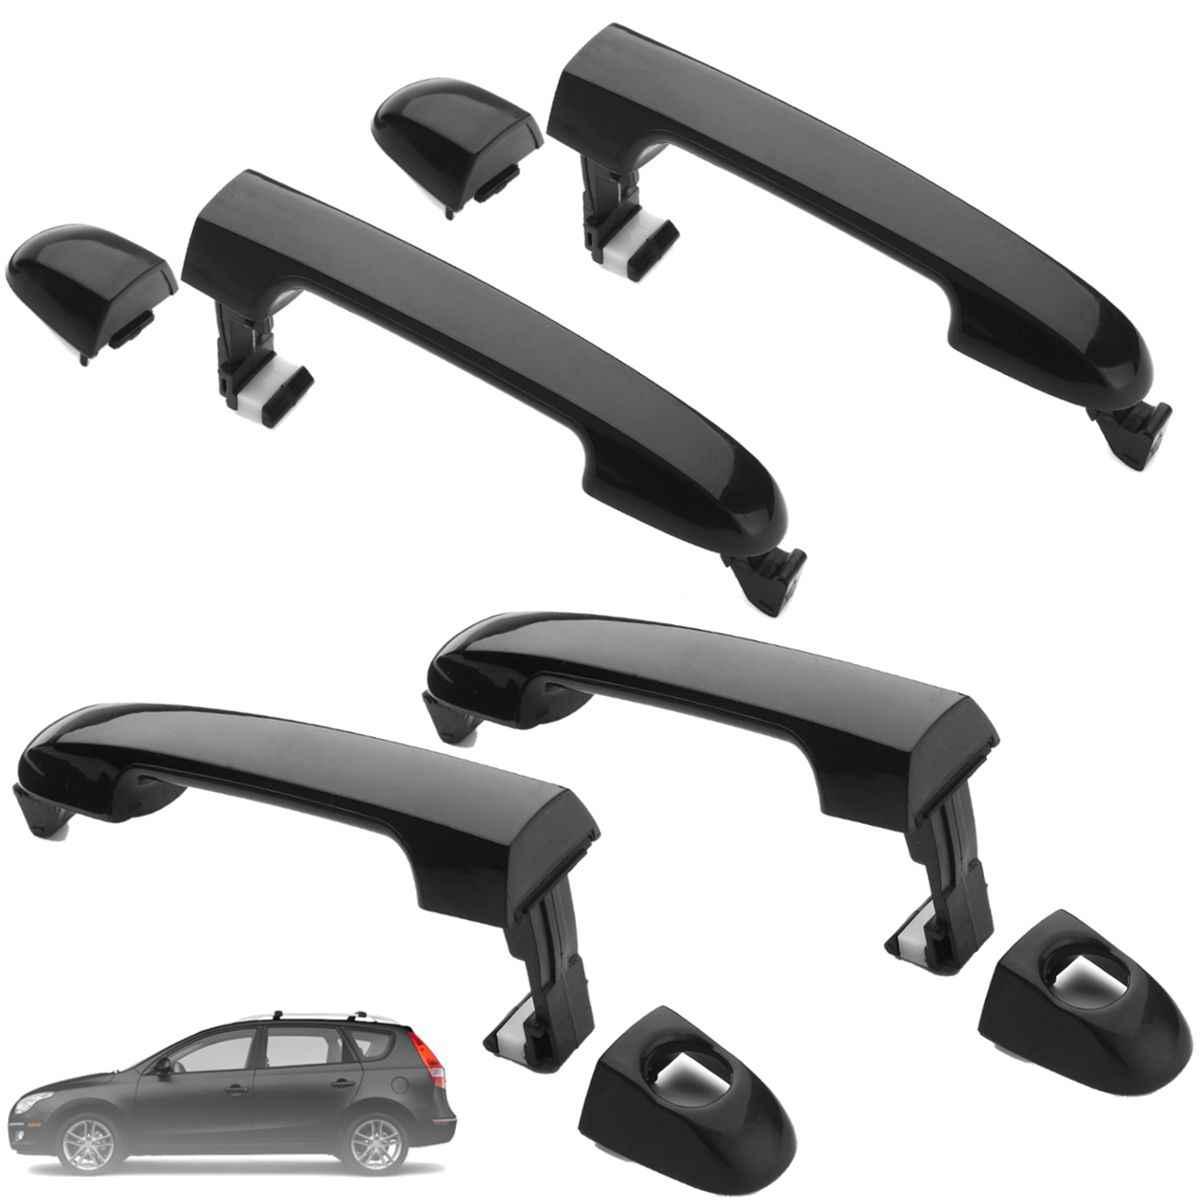 Front Right Rear Left or Right Door Handle Black for Hyundai Elantra 2007 2012